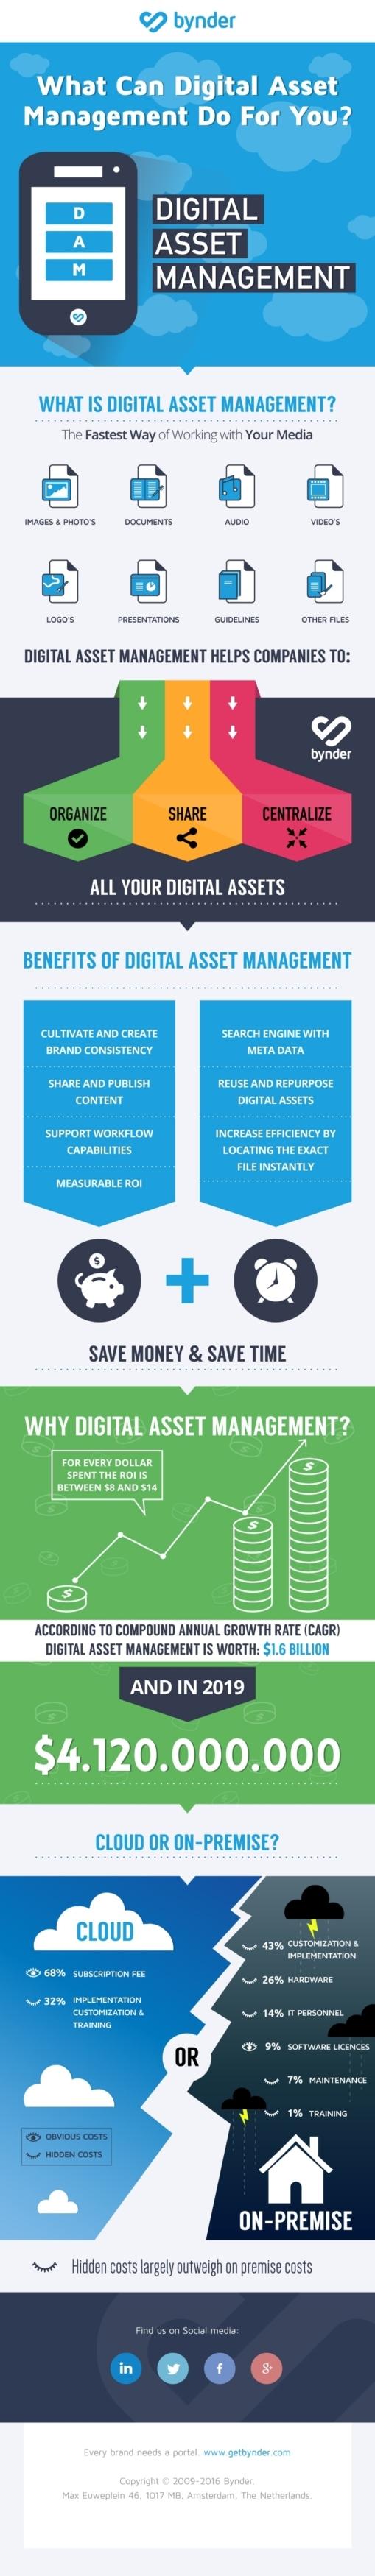 Digital Asset Management Infographic